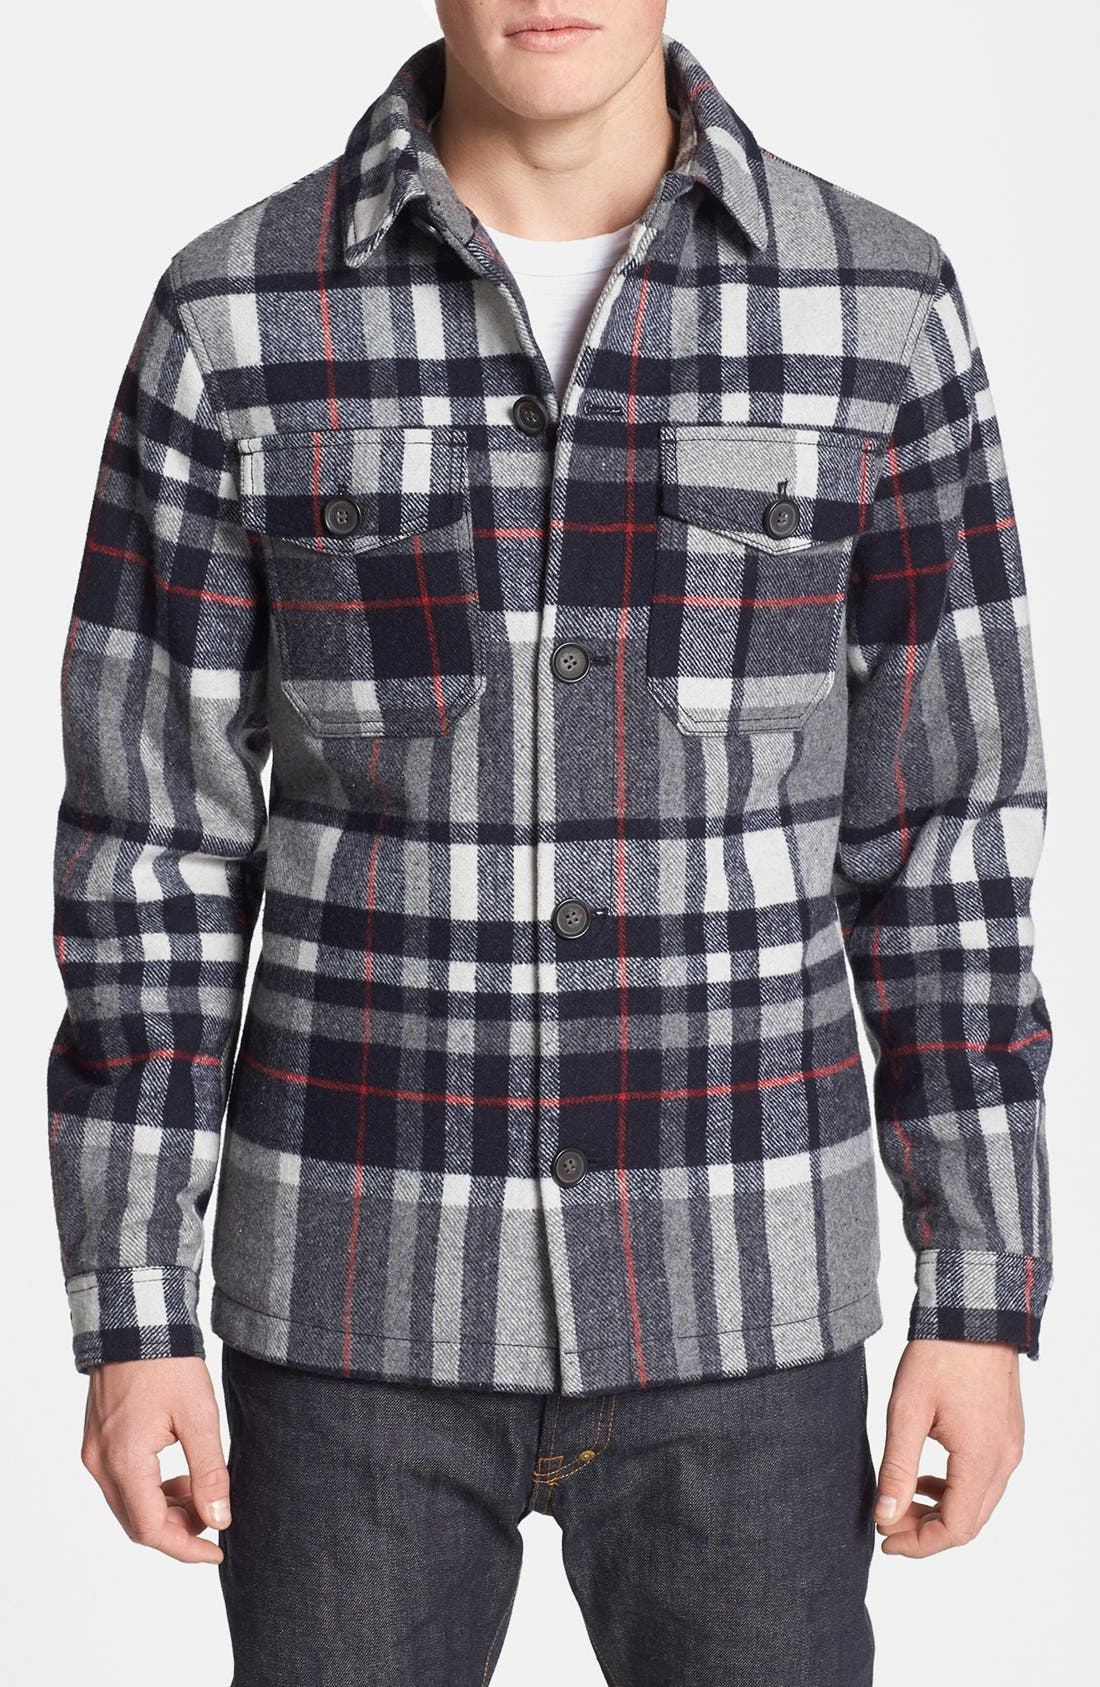 Main Image - Topman Check Wool Blend Flannel Shirt Jacket